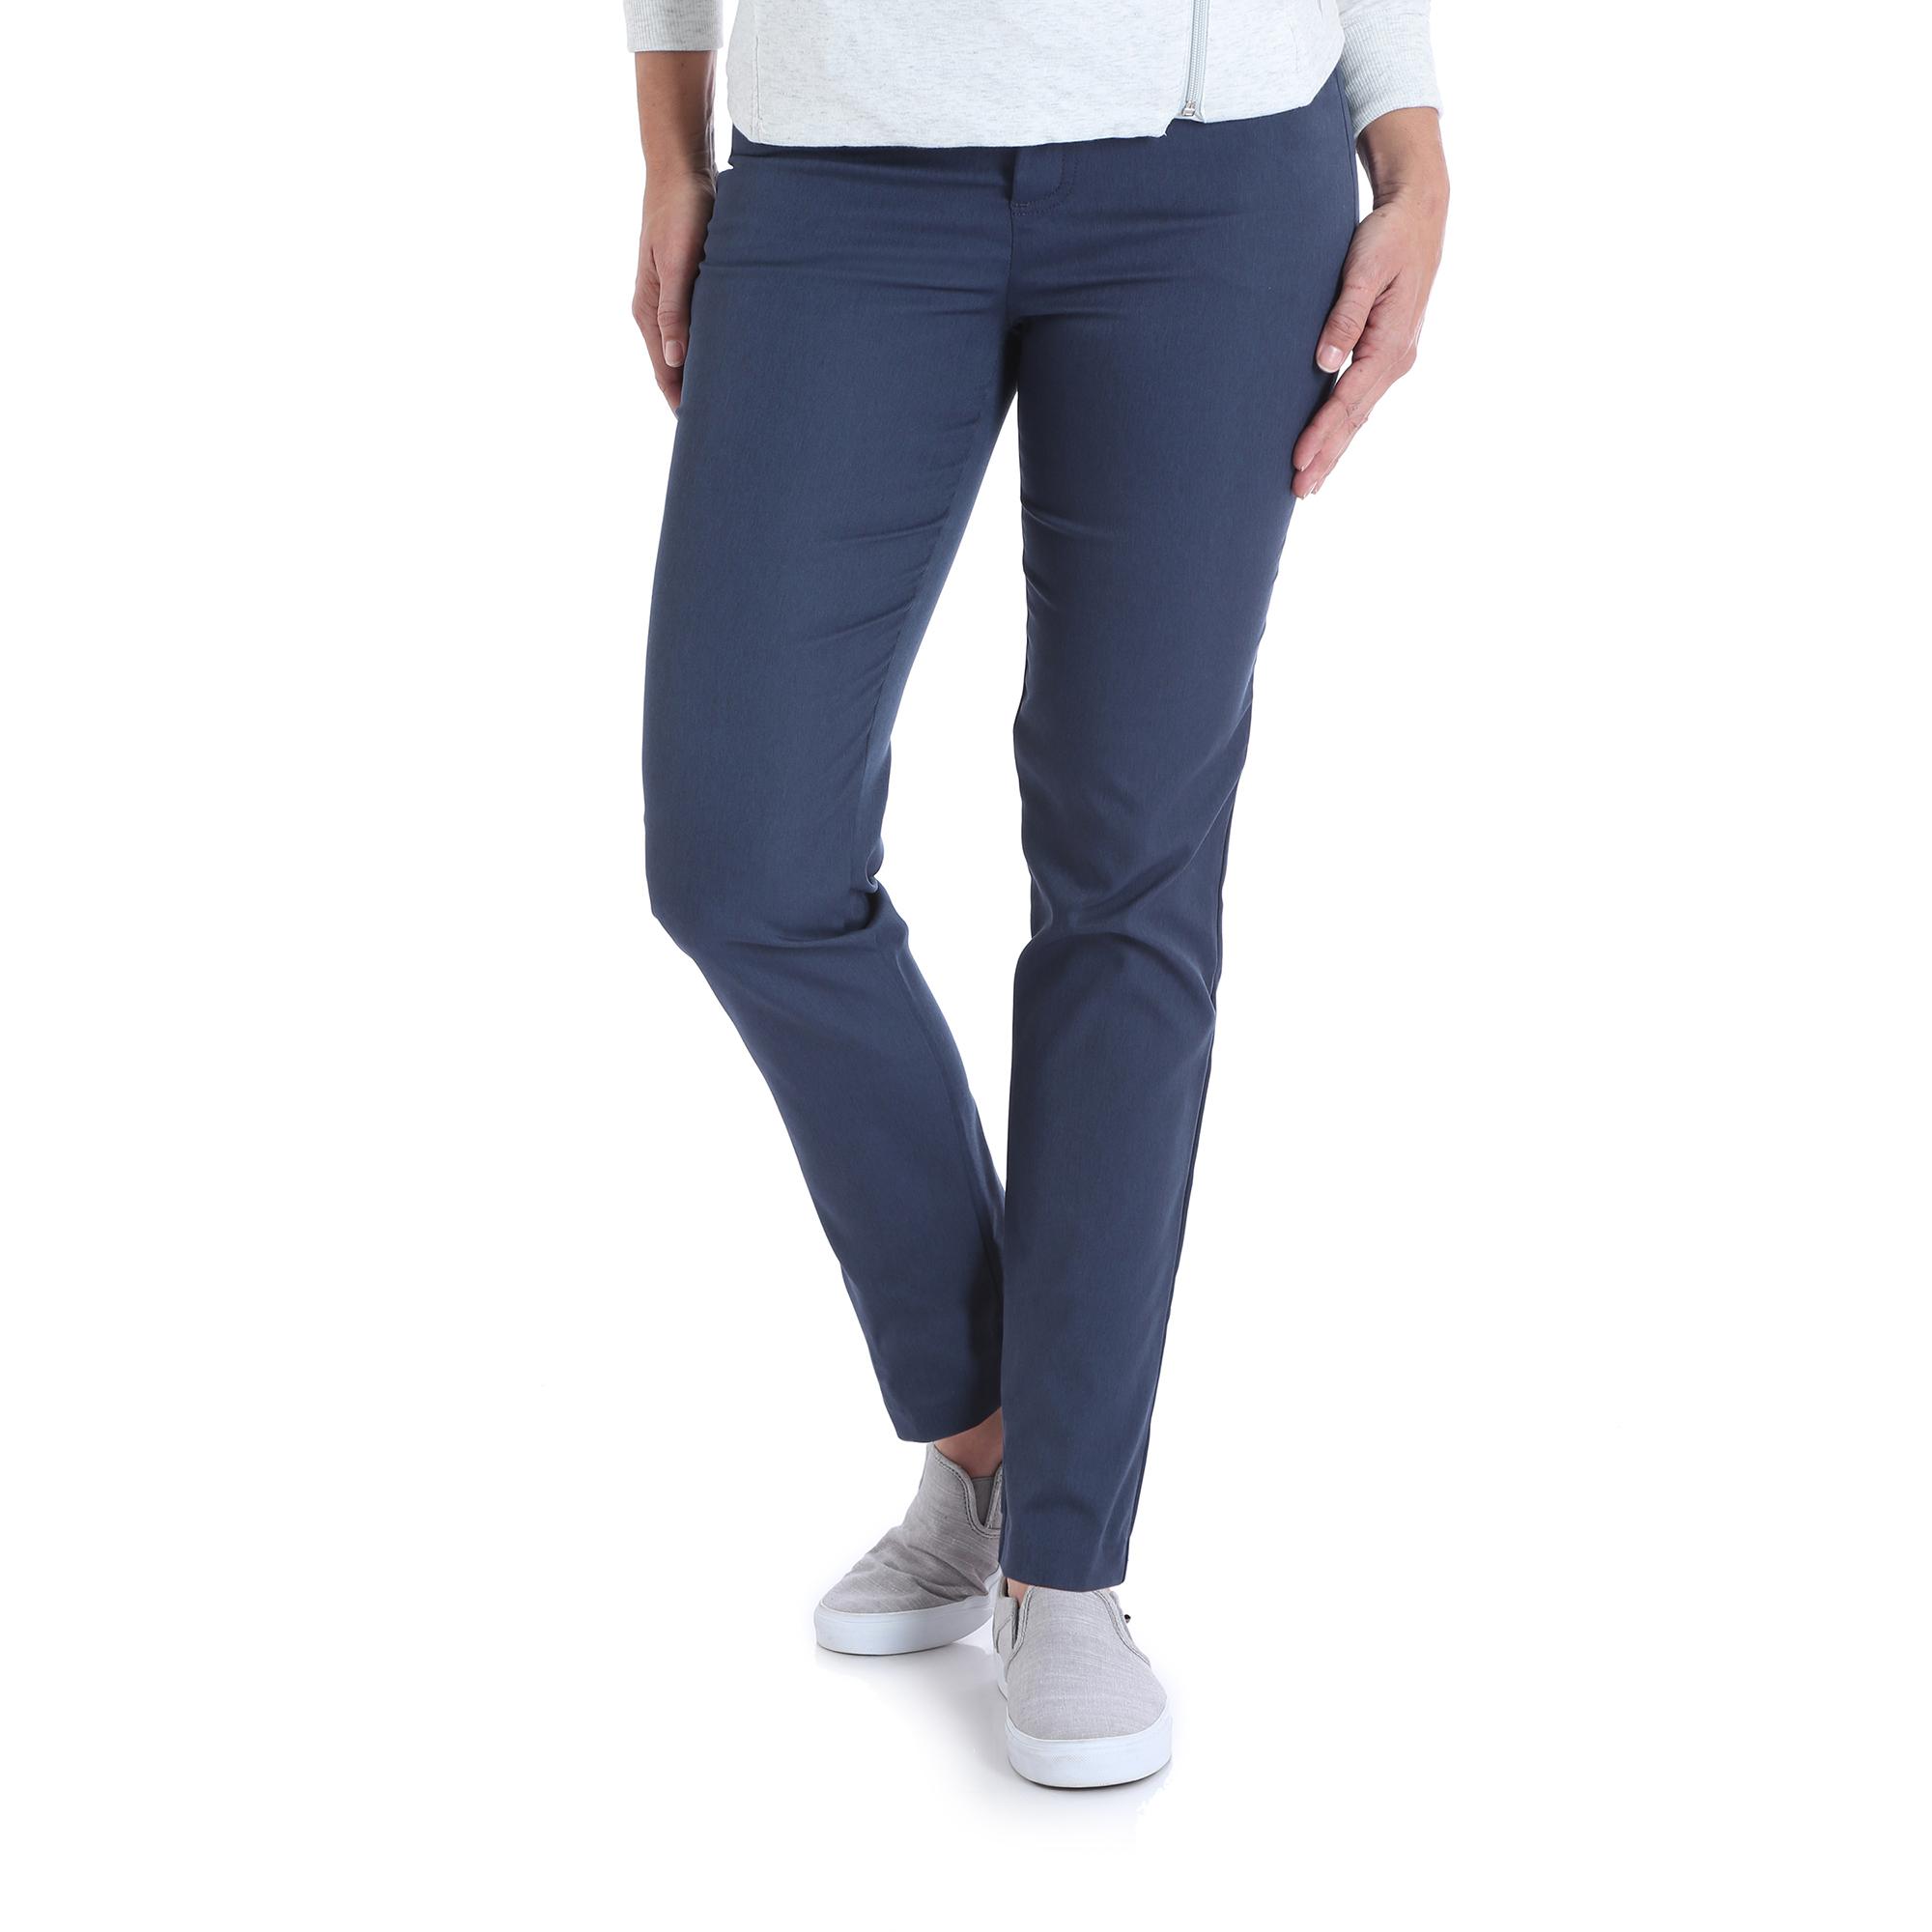 W36CS46 - On-the-Go Slim Ankle Pant